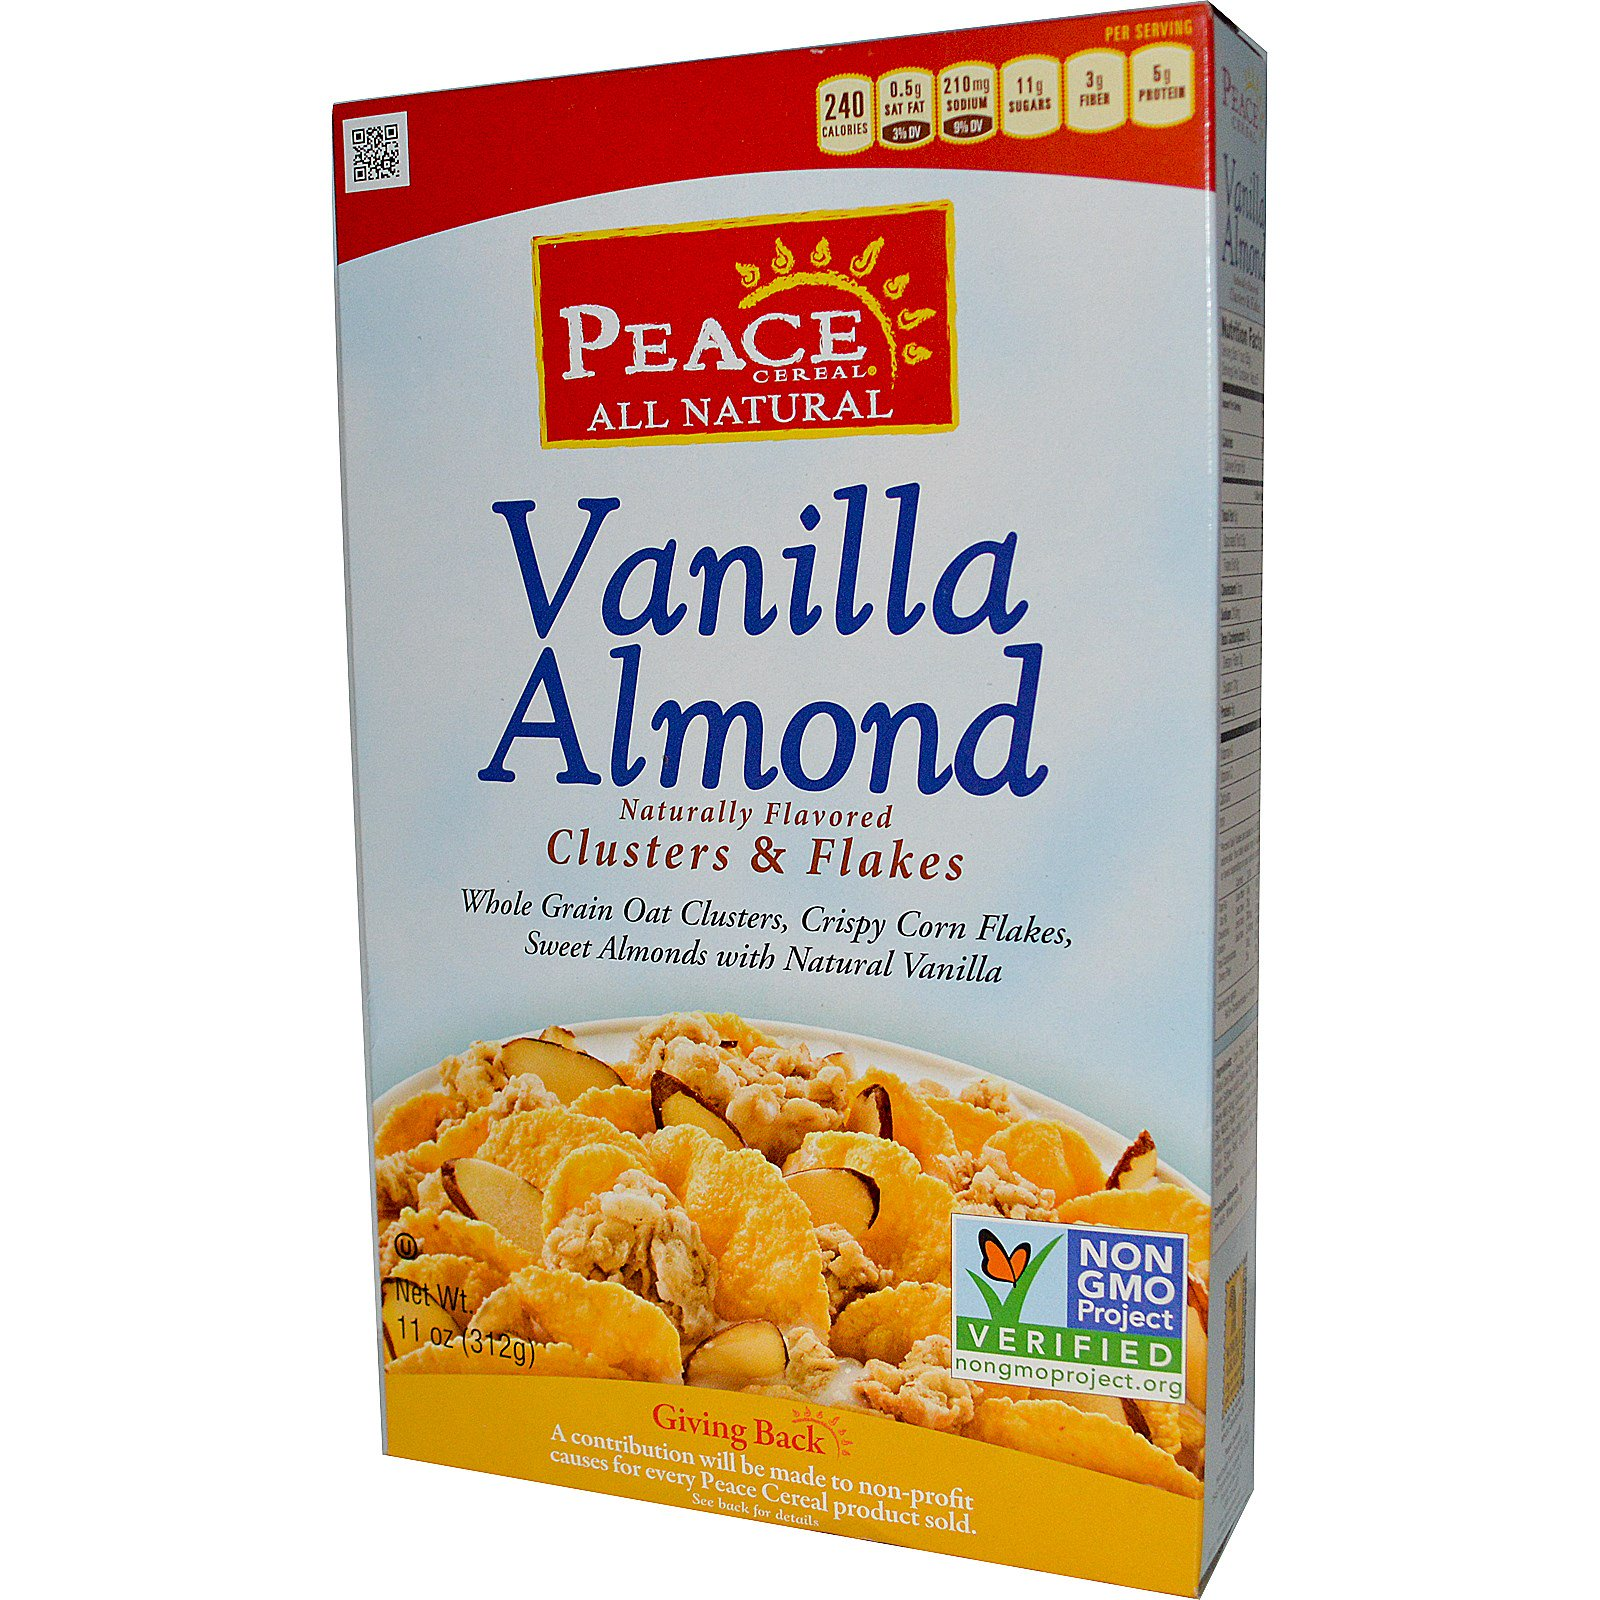 Peace Cereal, кусочки и хлопья, ваниль и миндаль, 11 унций (312 г)